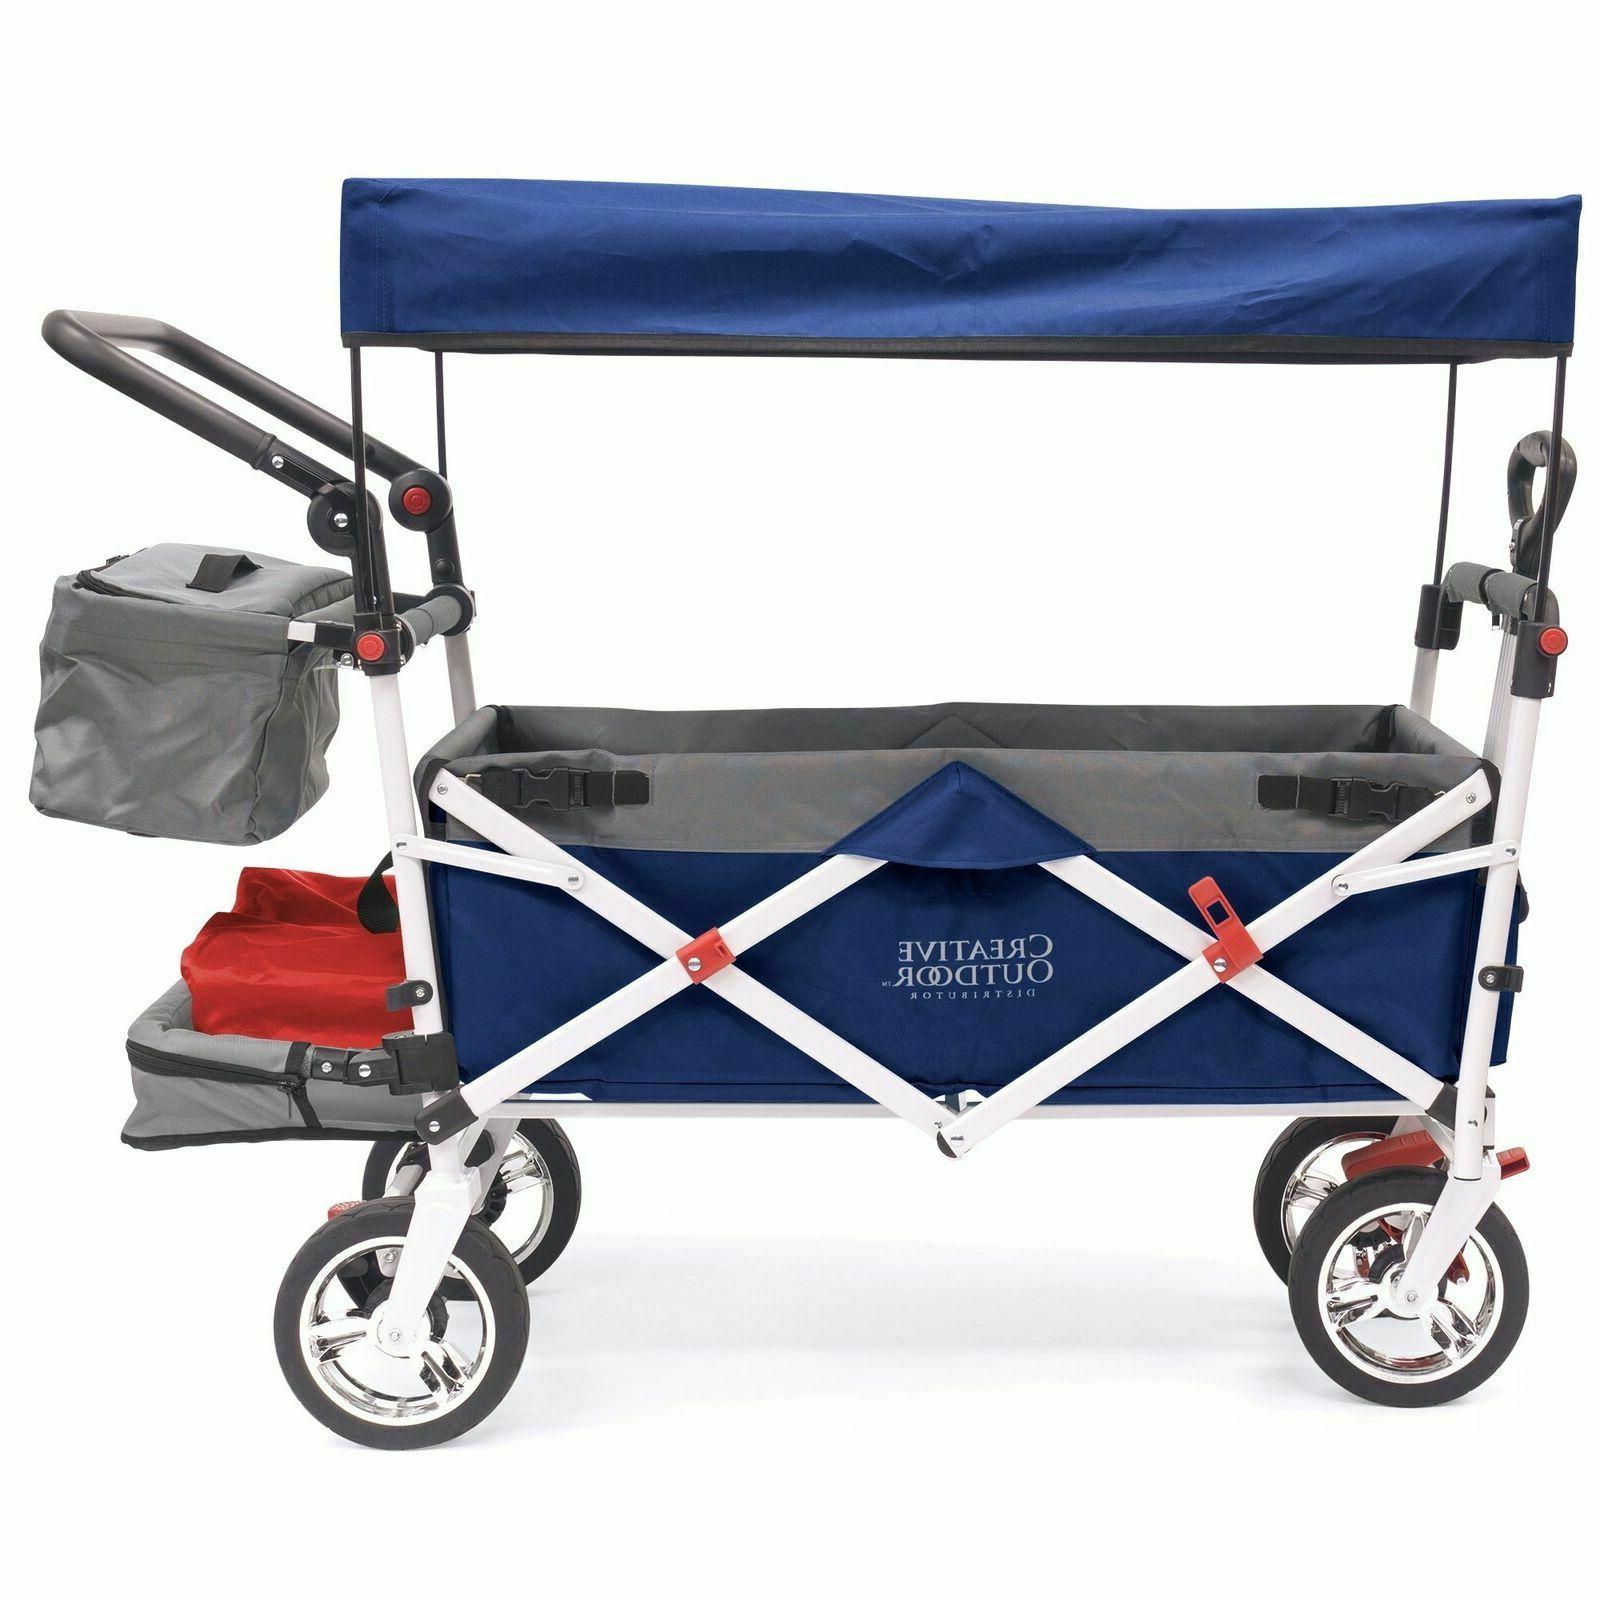 push pull collapsible folding wagon